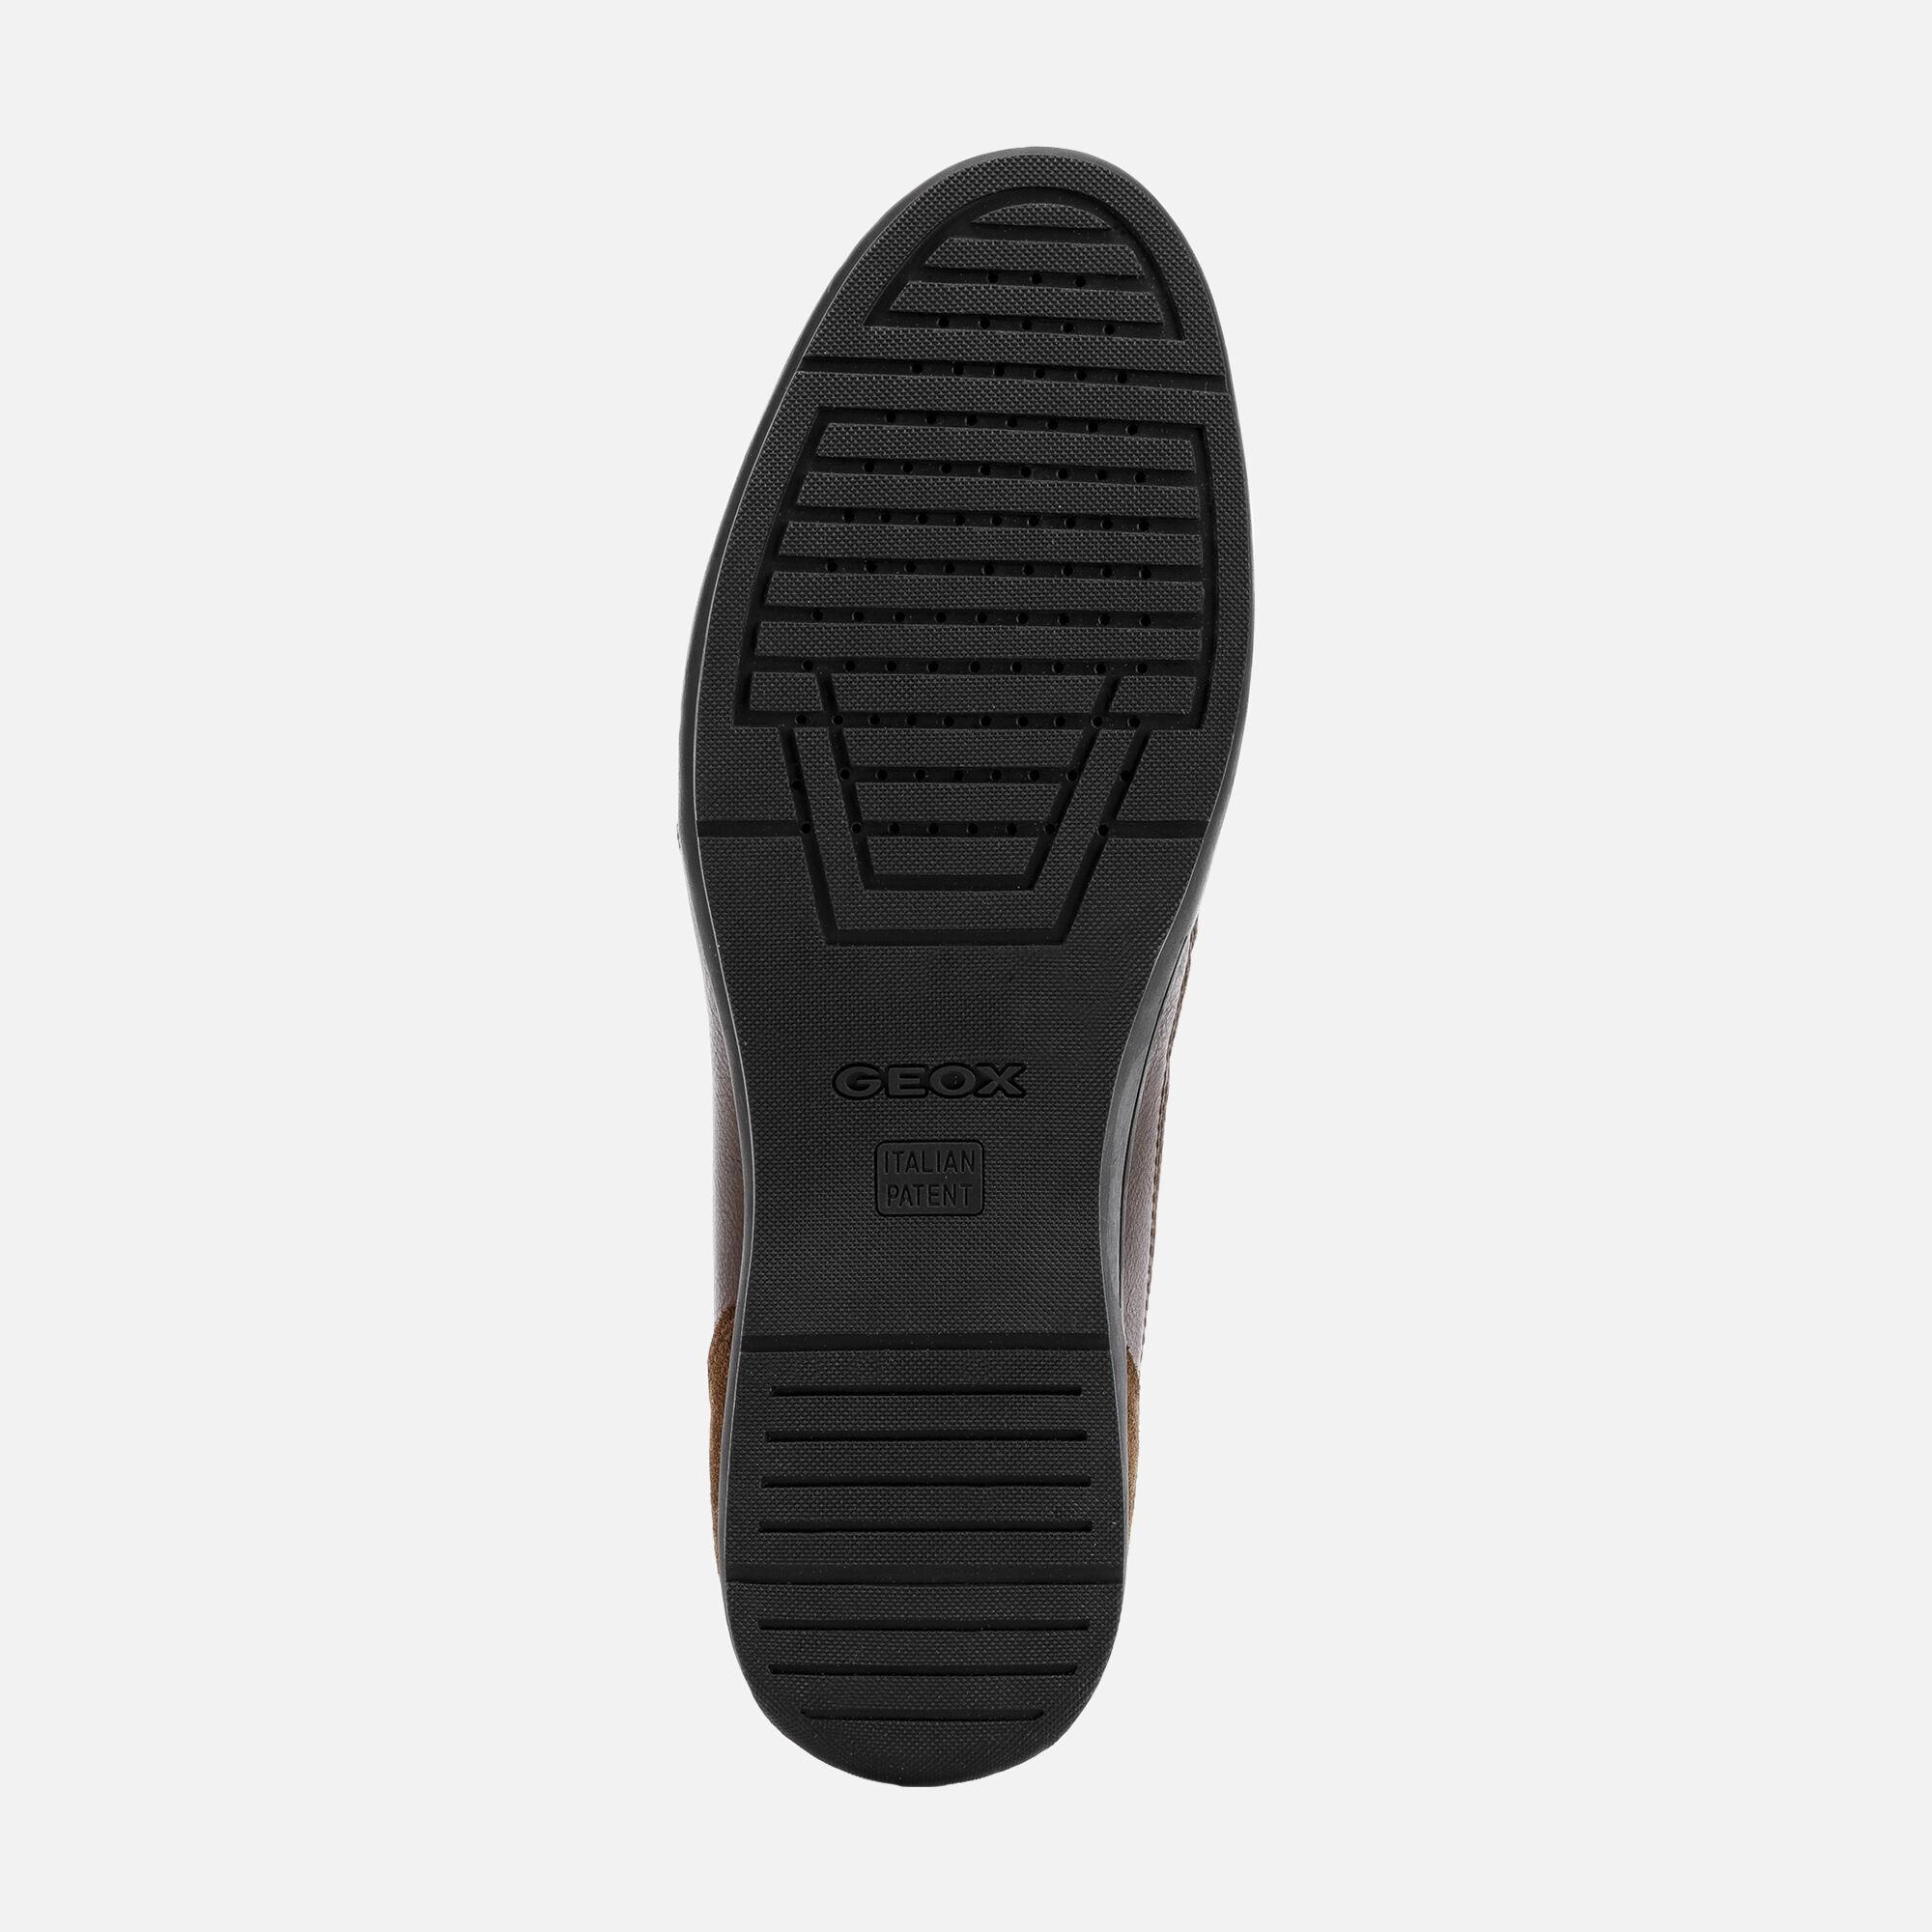 Geox ADRIEN Scarpe Casual Marroni Uomo   Geox® Online store